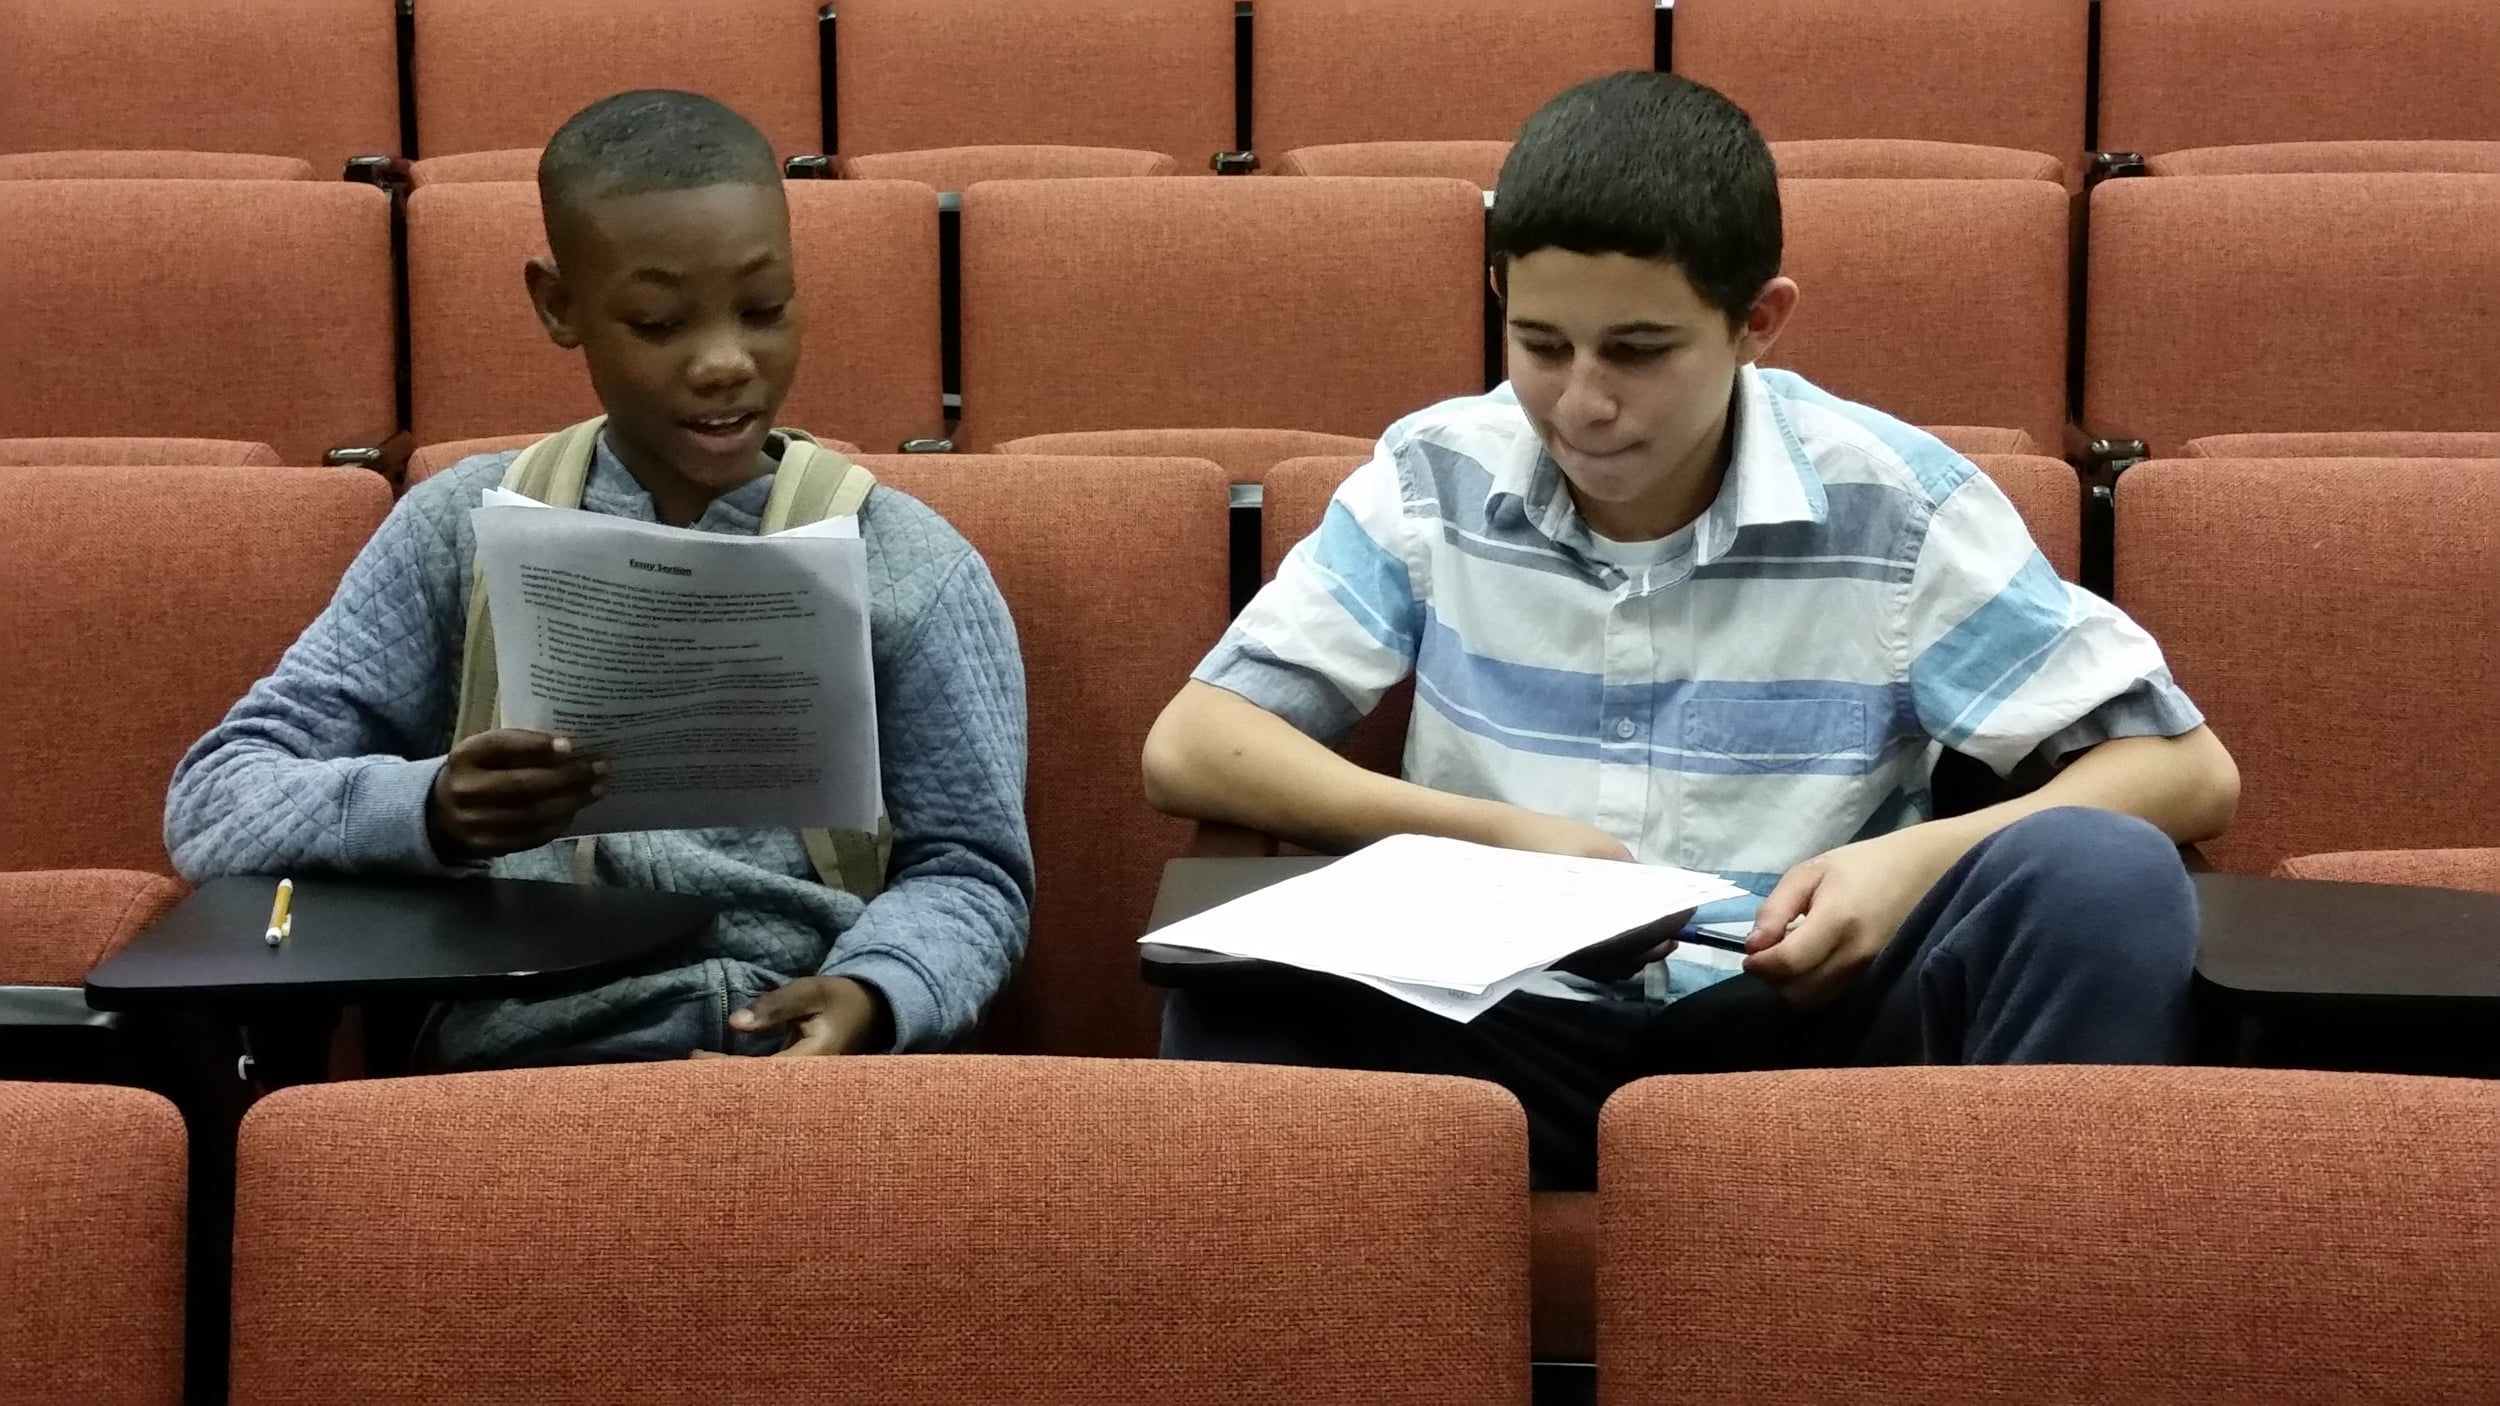 BEAM boys write essays to prepare for high school